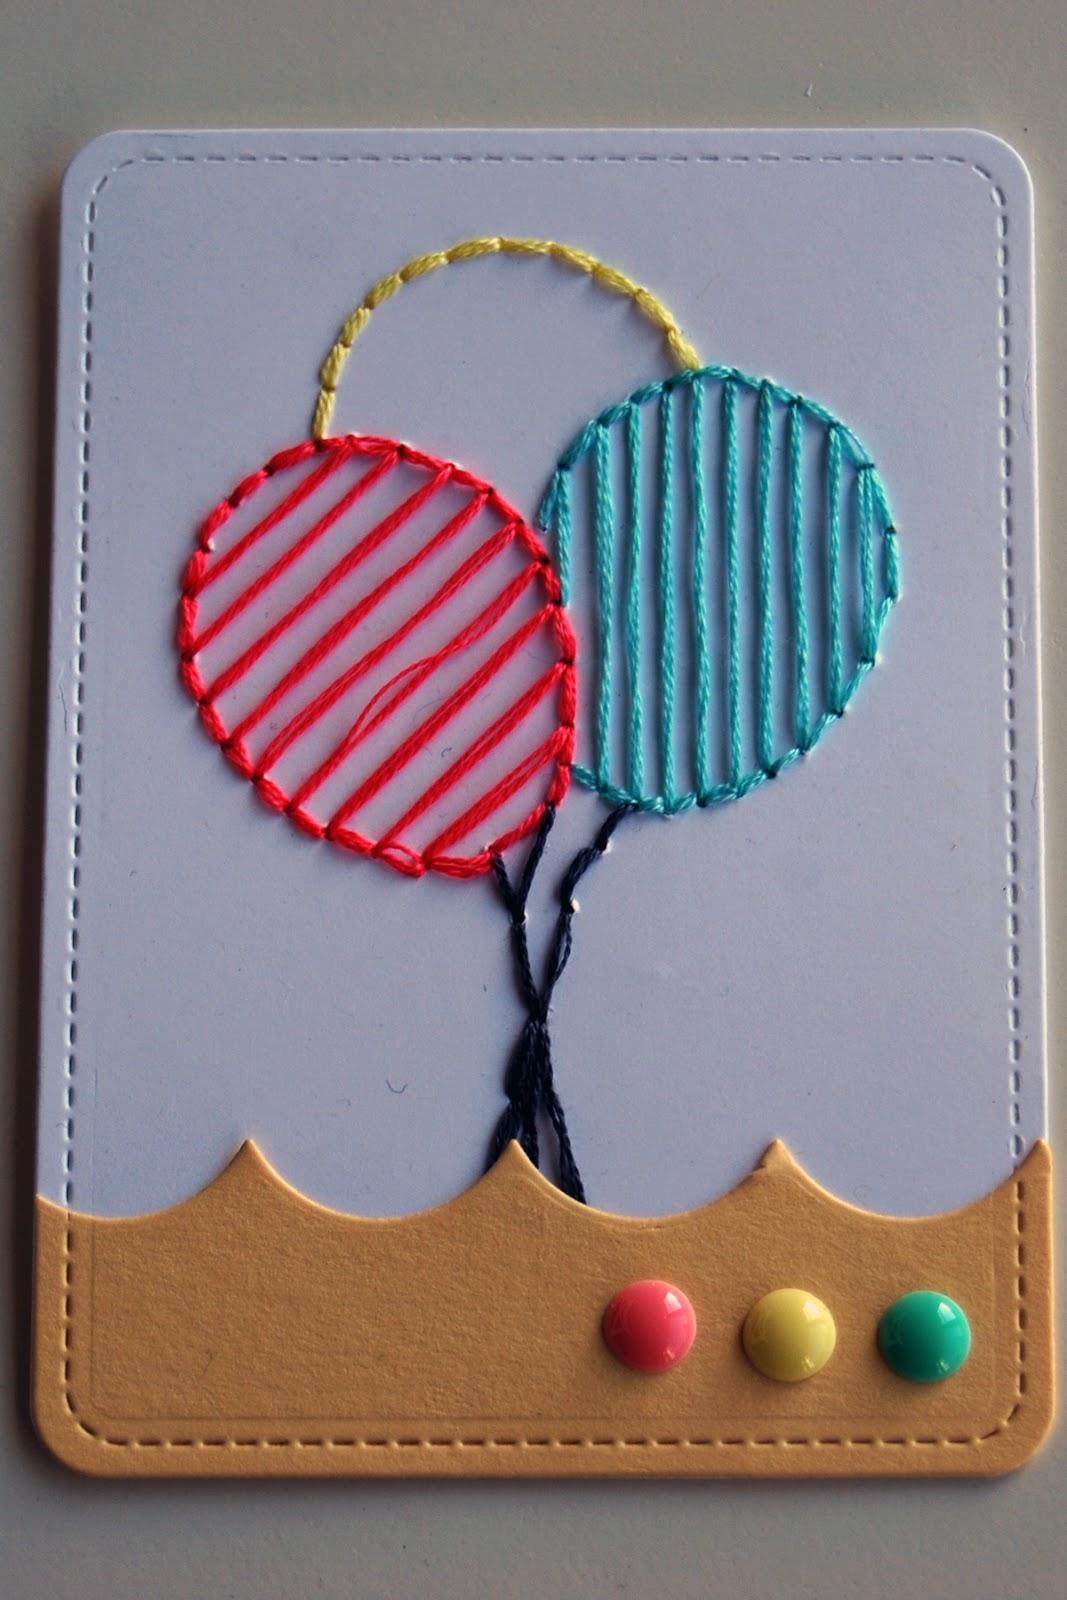 DIY PL card with stitching by Mandy Reedyk